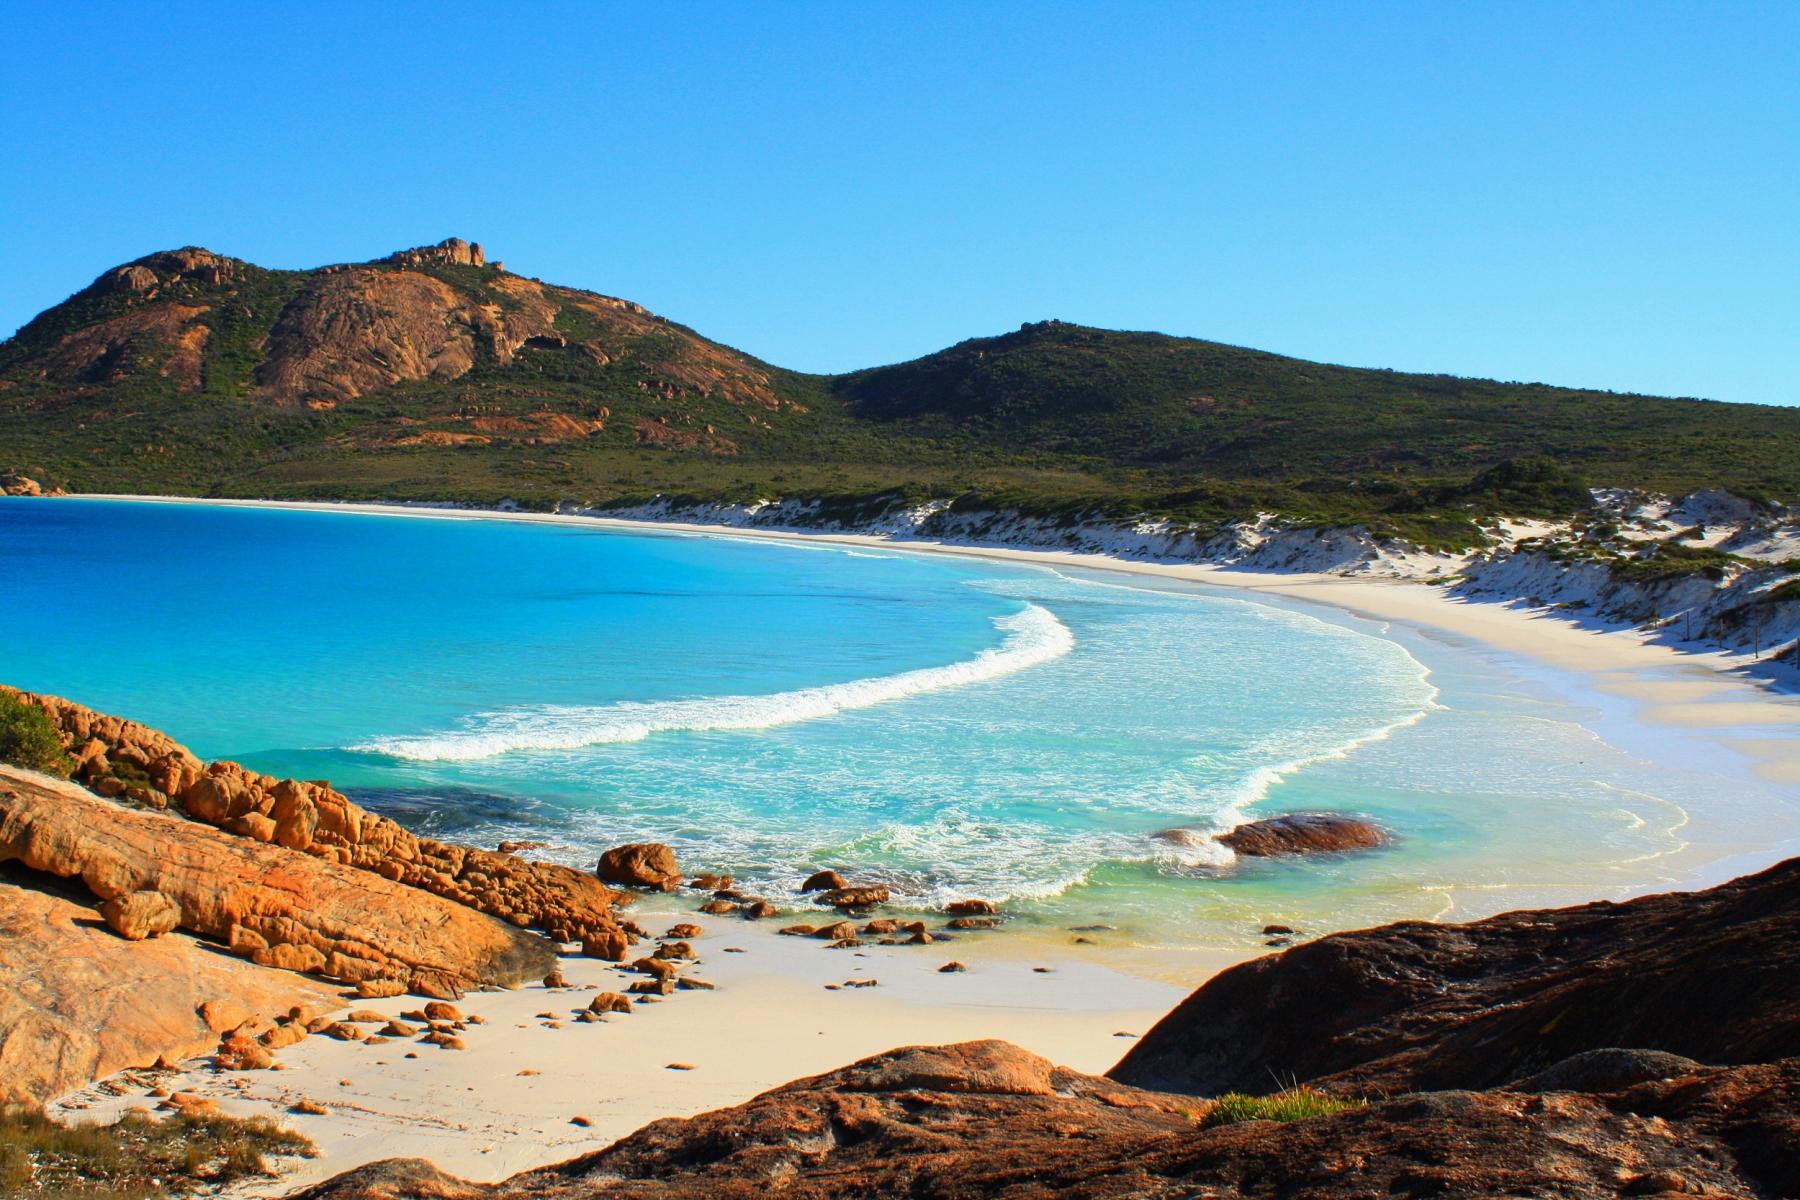 Twilight-Cove-Cape-Le-Grand-National-Park-Espereance-Western-Australia